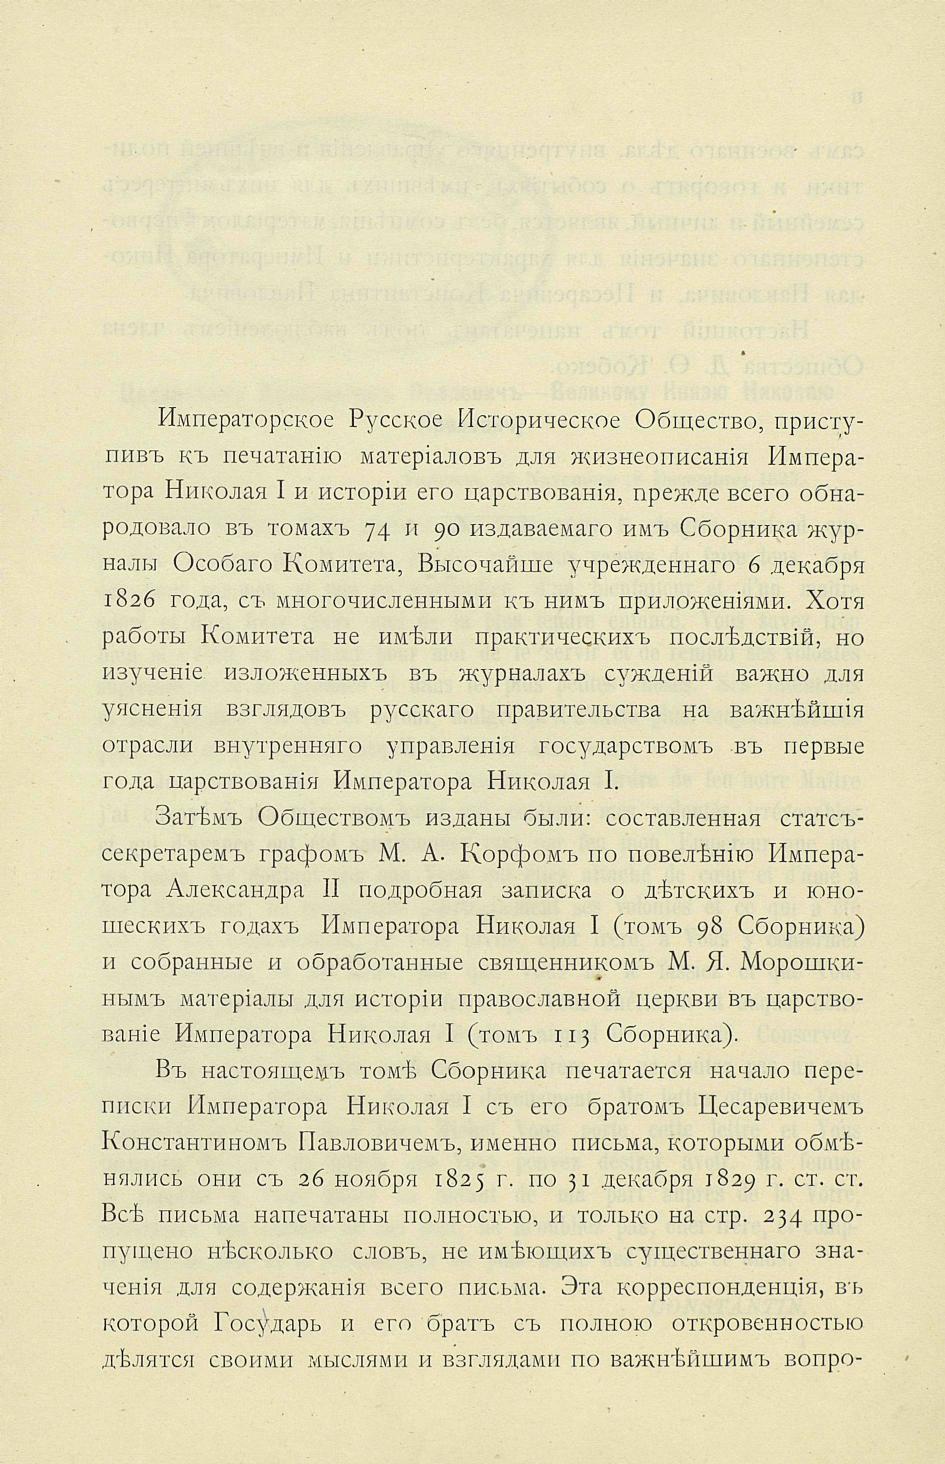 http://dlib.rsl.ru/viewer/pdf?docId=01004230188&page=7